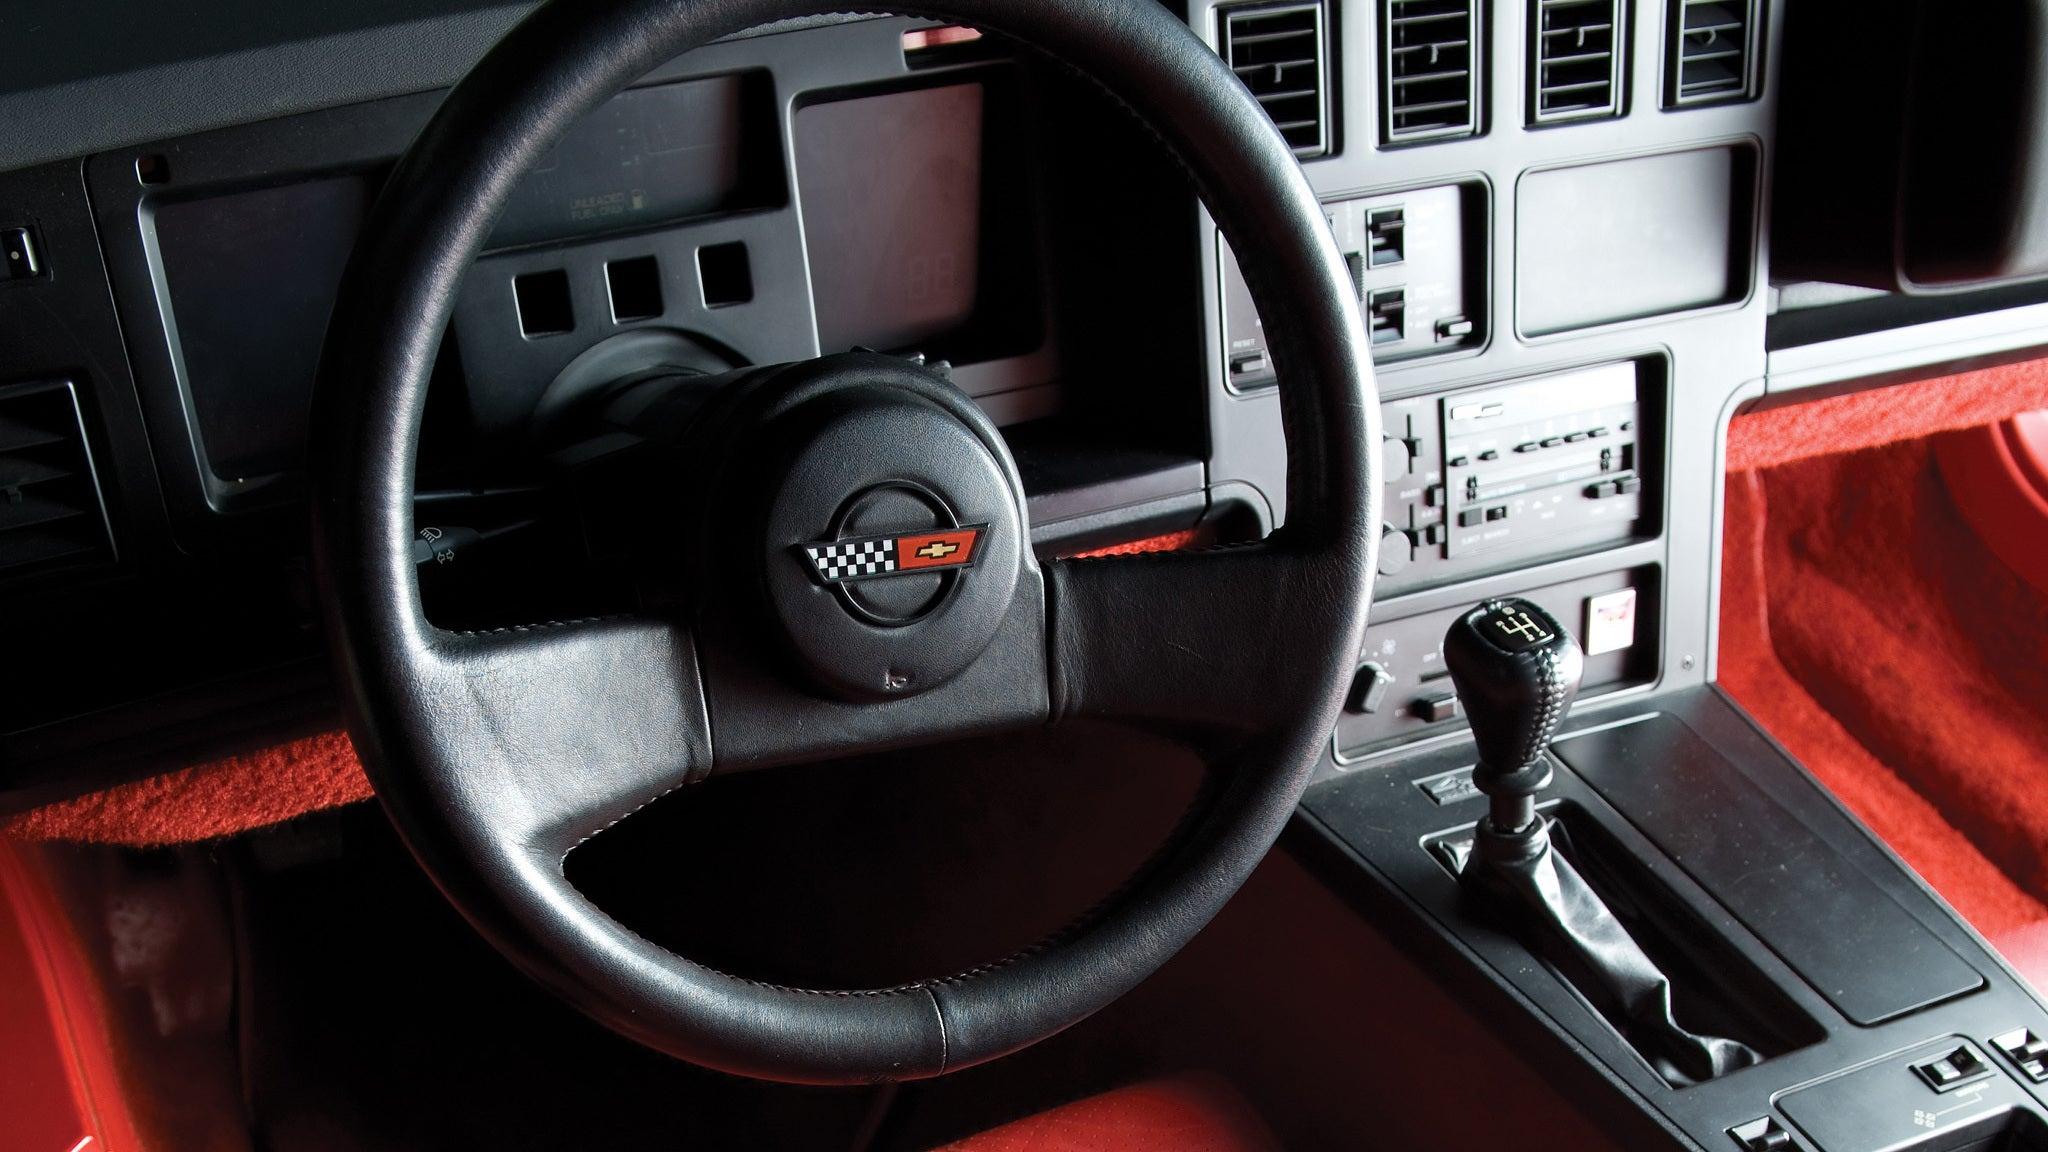 the chevrolet corvette c4 s doug nash 4 3 manual transmission is rh jalopnik com Auto Transmission Shops Auto Transmission Specialists